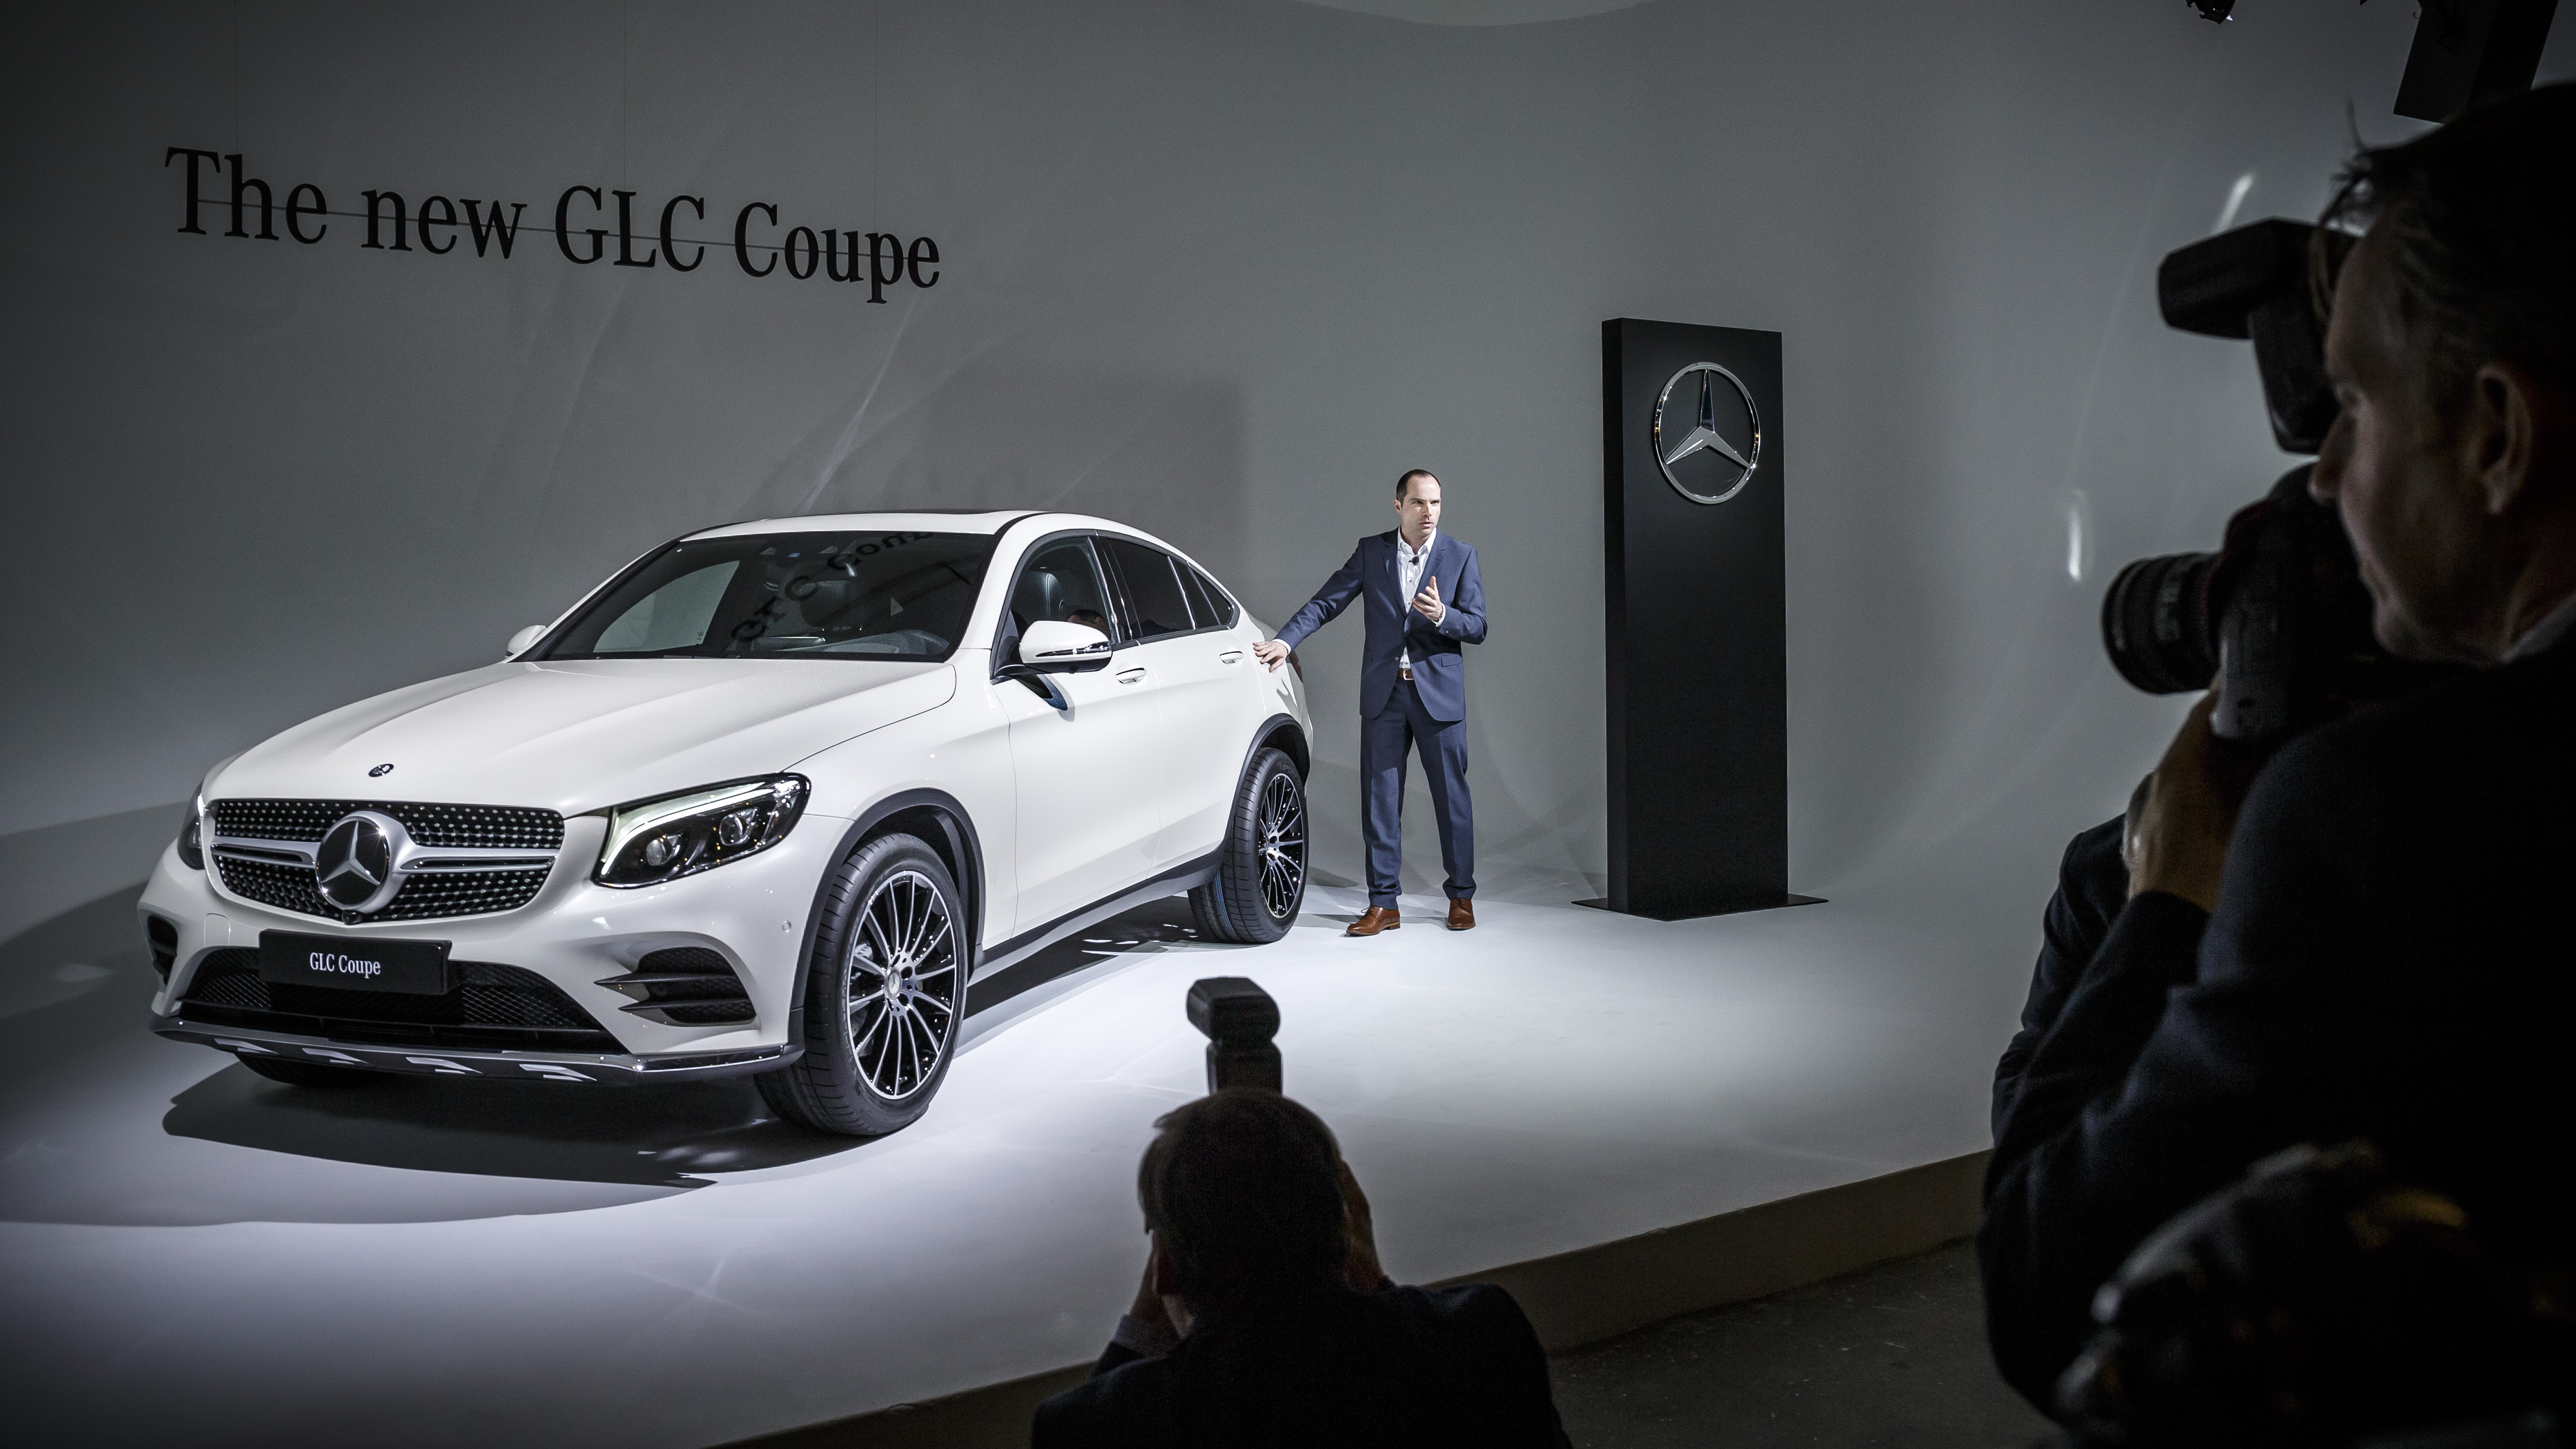 Weltpremiere des Mercedes-Benz GLC Coupé am Vorabend der New York International Auto Show 2016: Robert Lesnik, Leiter Exterieur Design   World Premiere of the Mercedes-Benz GLC Coupé on the eve of the 2016 New York International Auto Show: Robert Lesnik, Head of Exterior Design